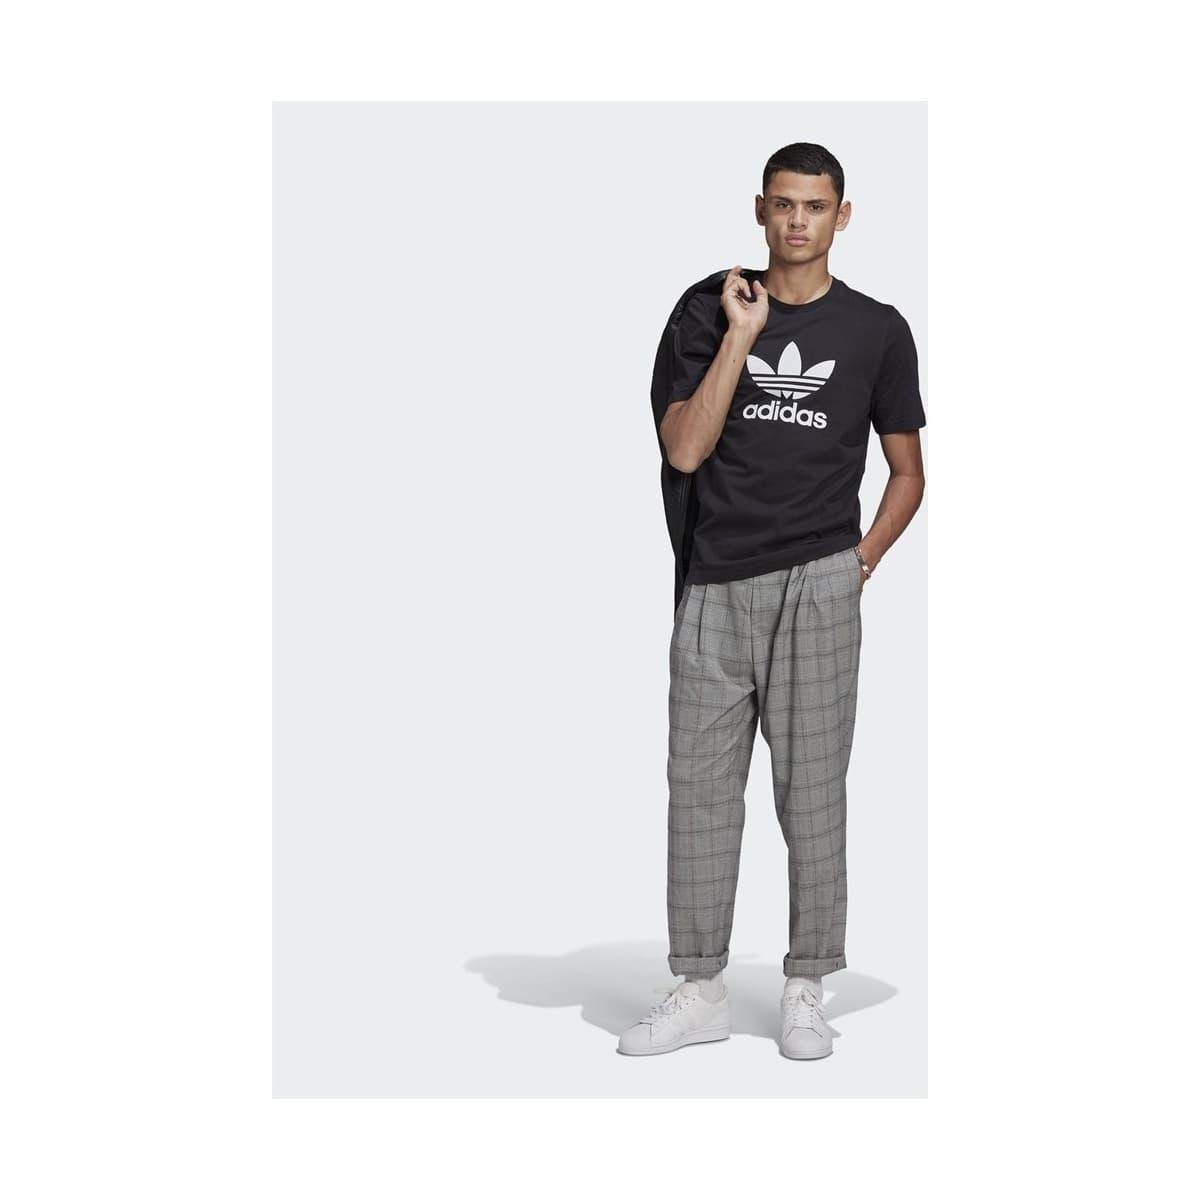 Adicolor Classics Trefoil Erkek Siyah Tişört (GN3462)